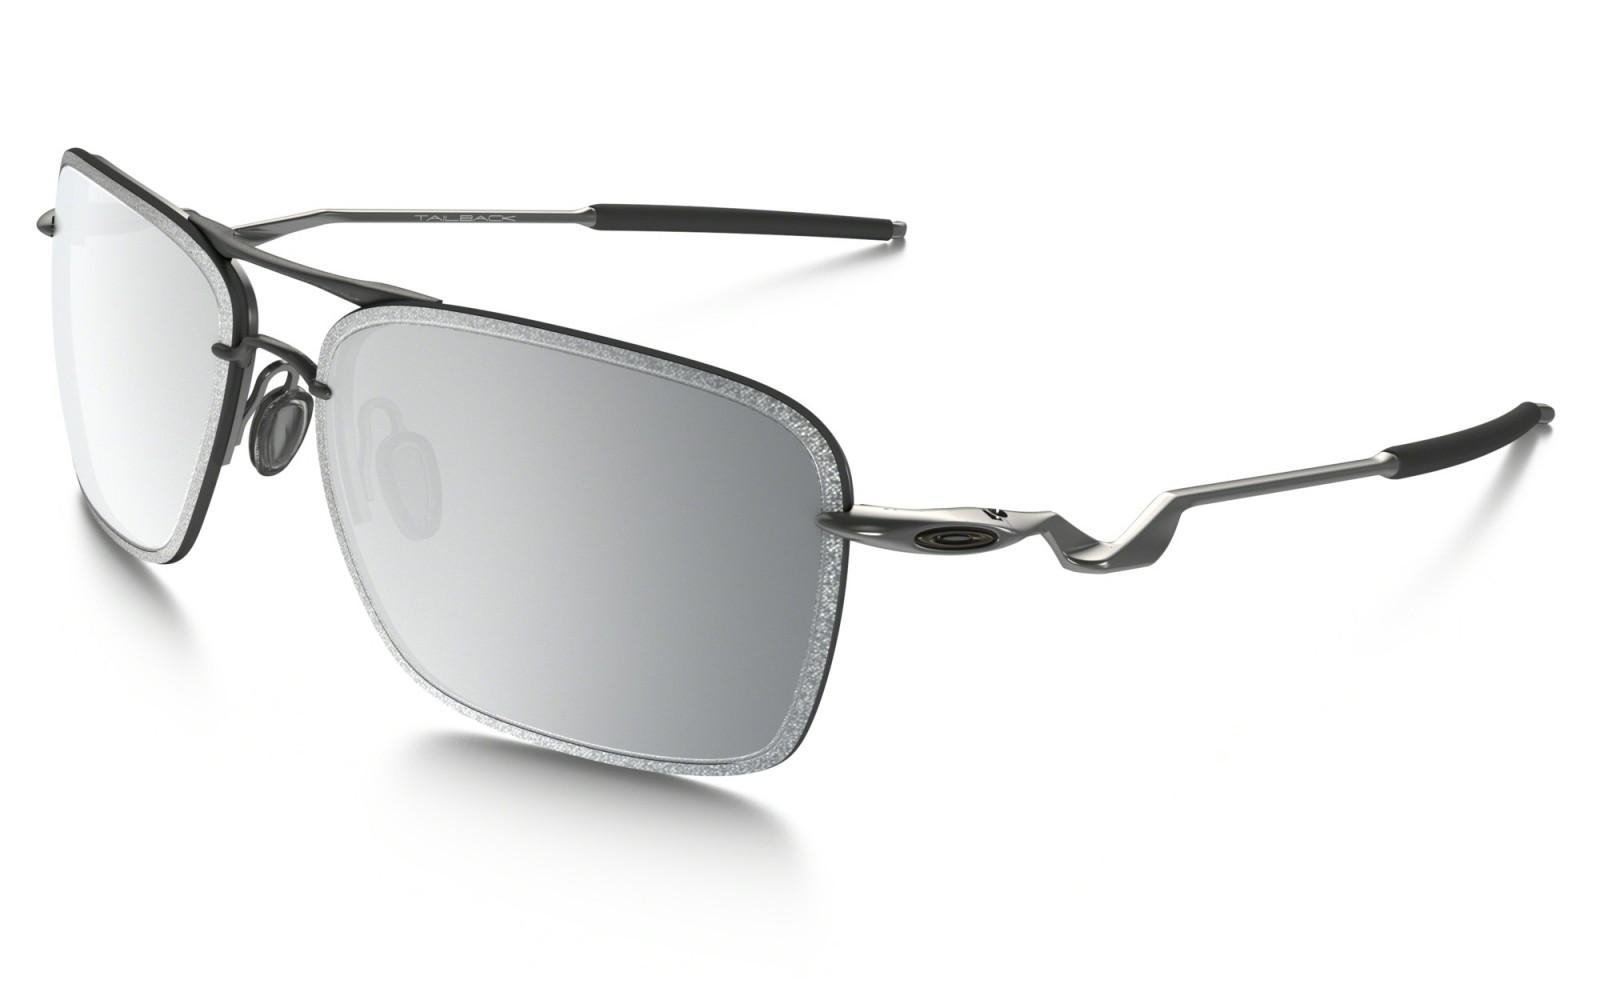 Oakley Tailback - Lead / Chrome Iridium - OO4109-04 Zonnebril